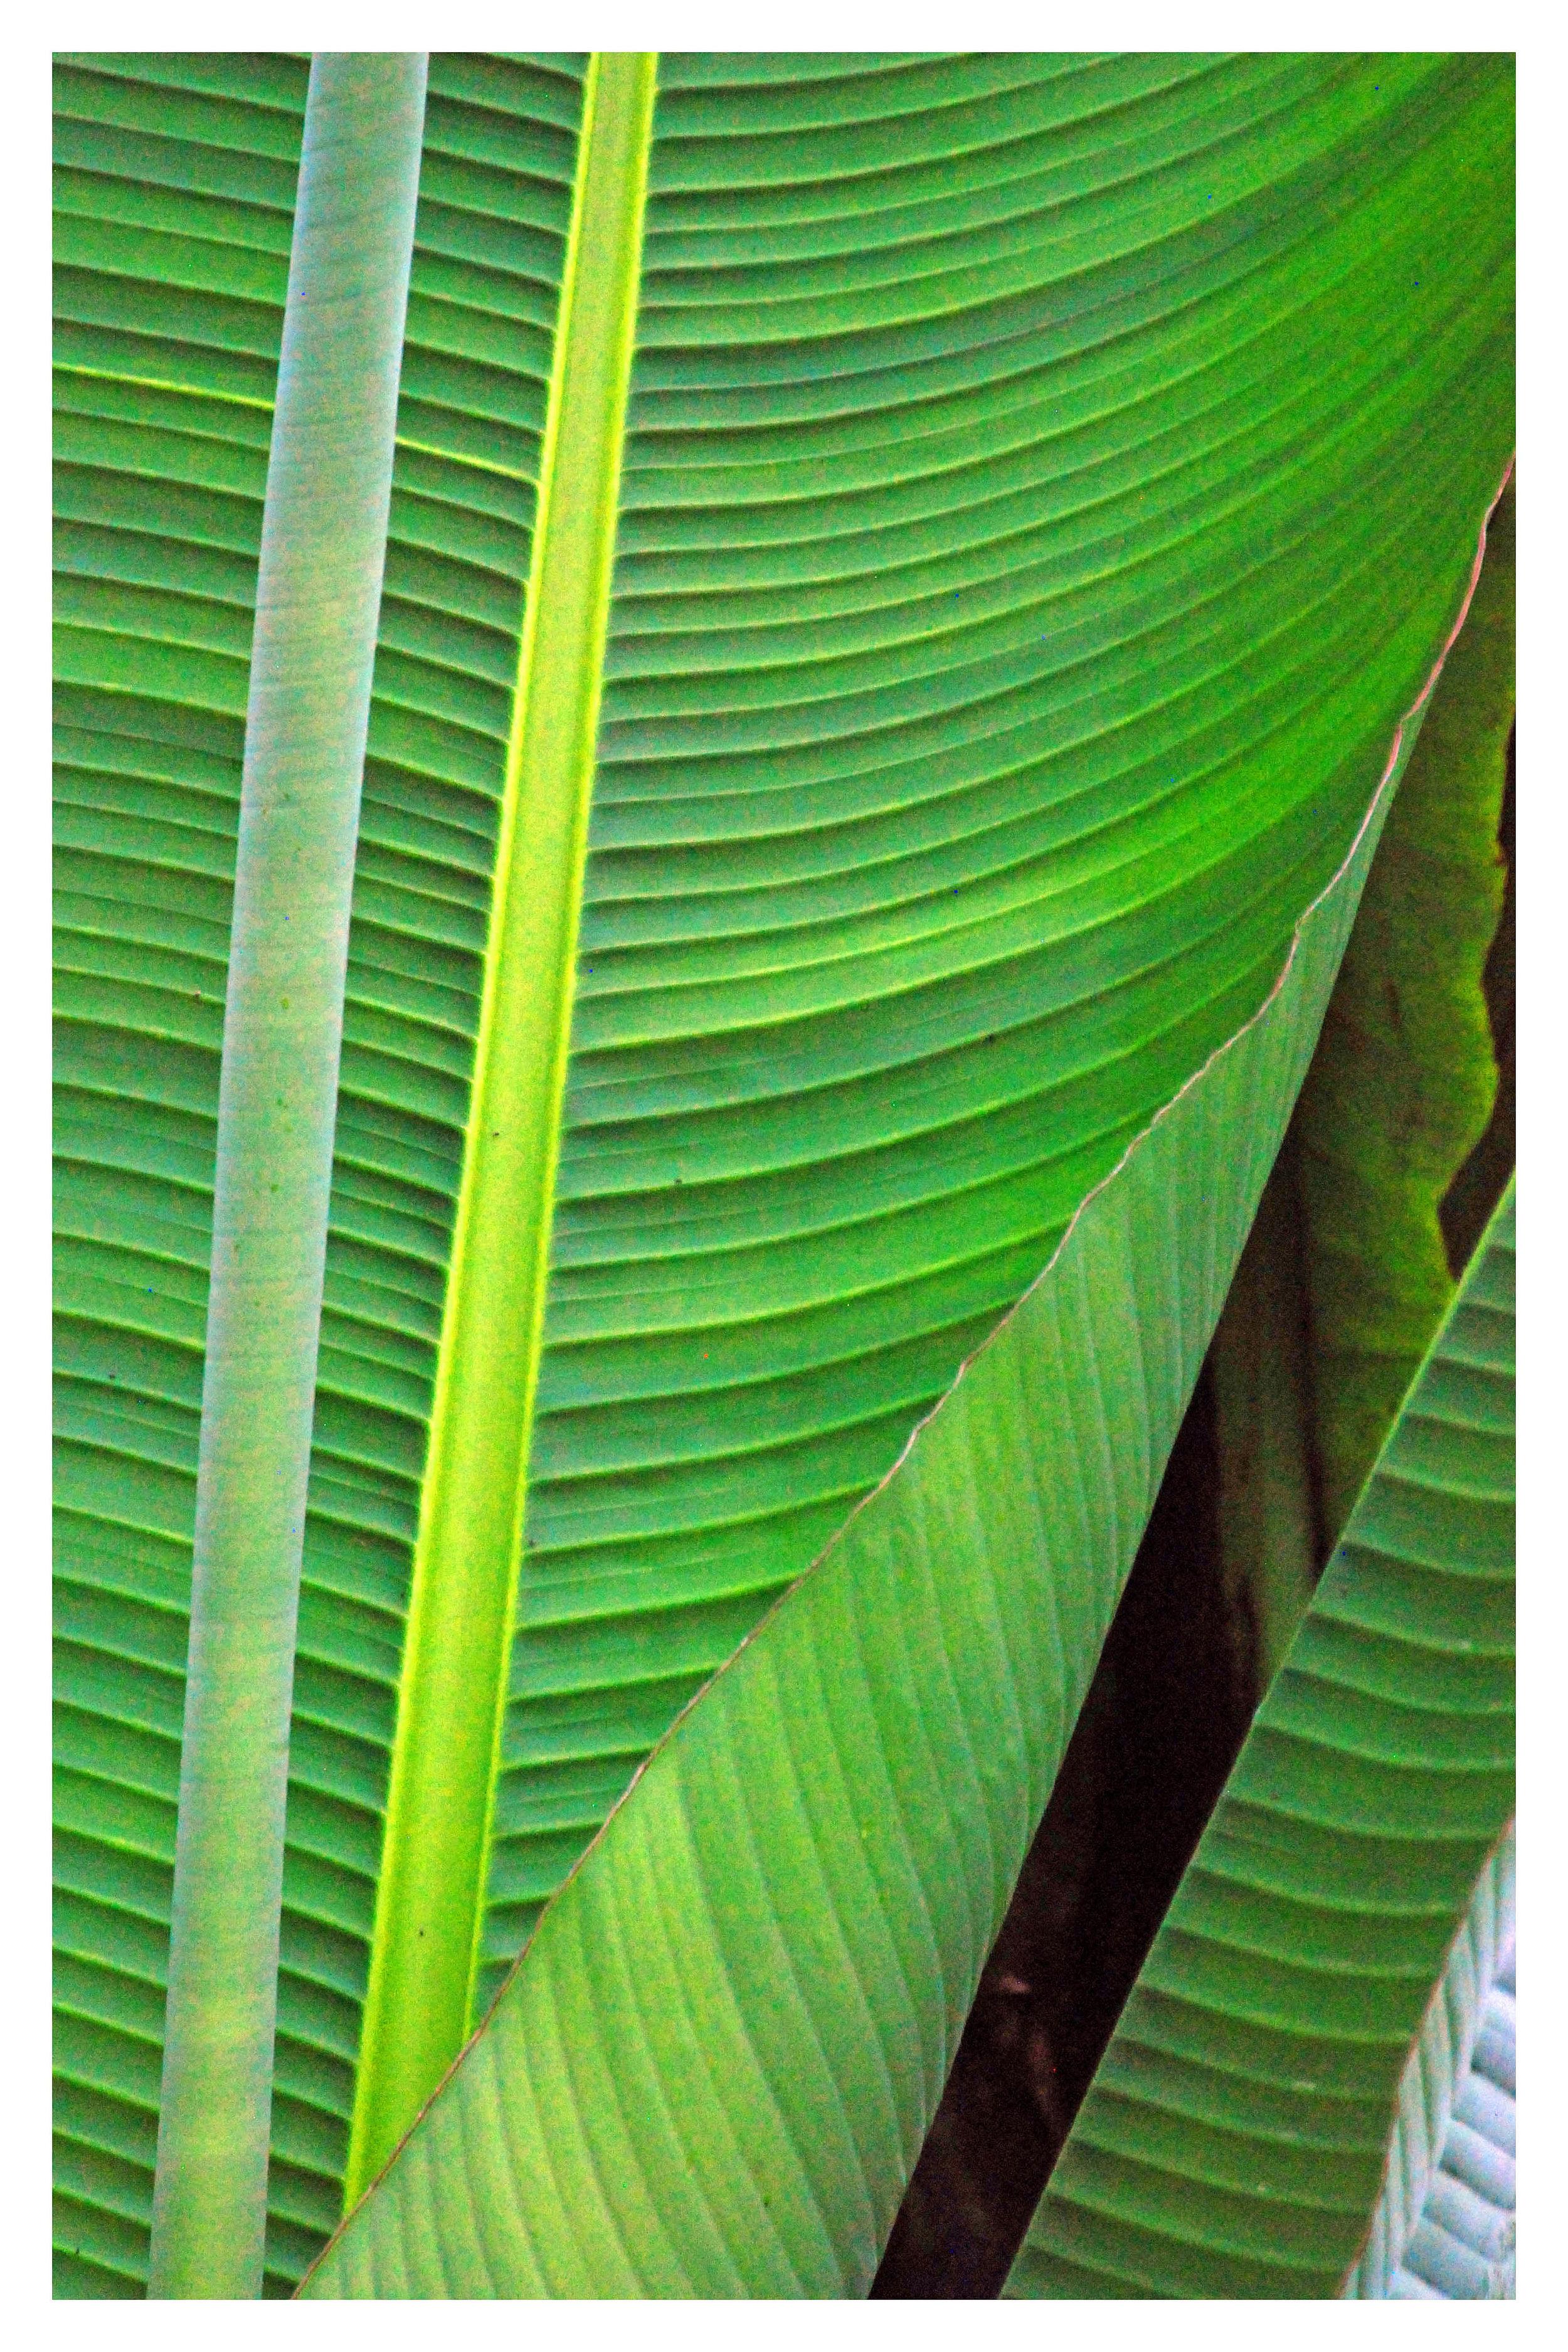 Bananenblad 30x45 incl rand.jpg